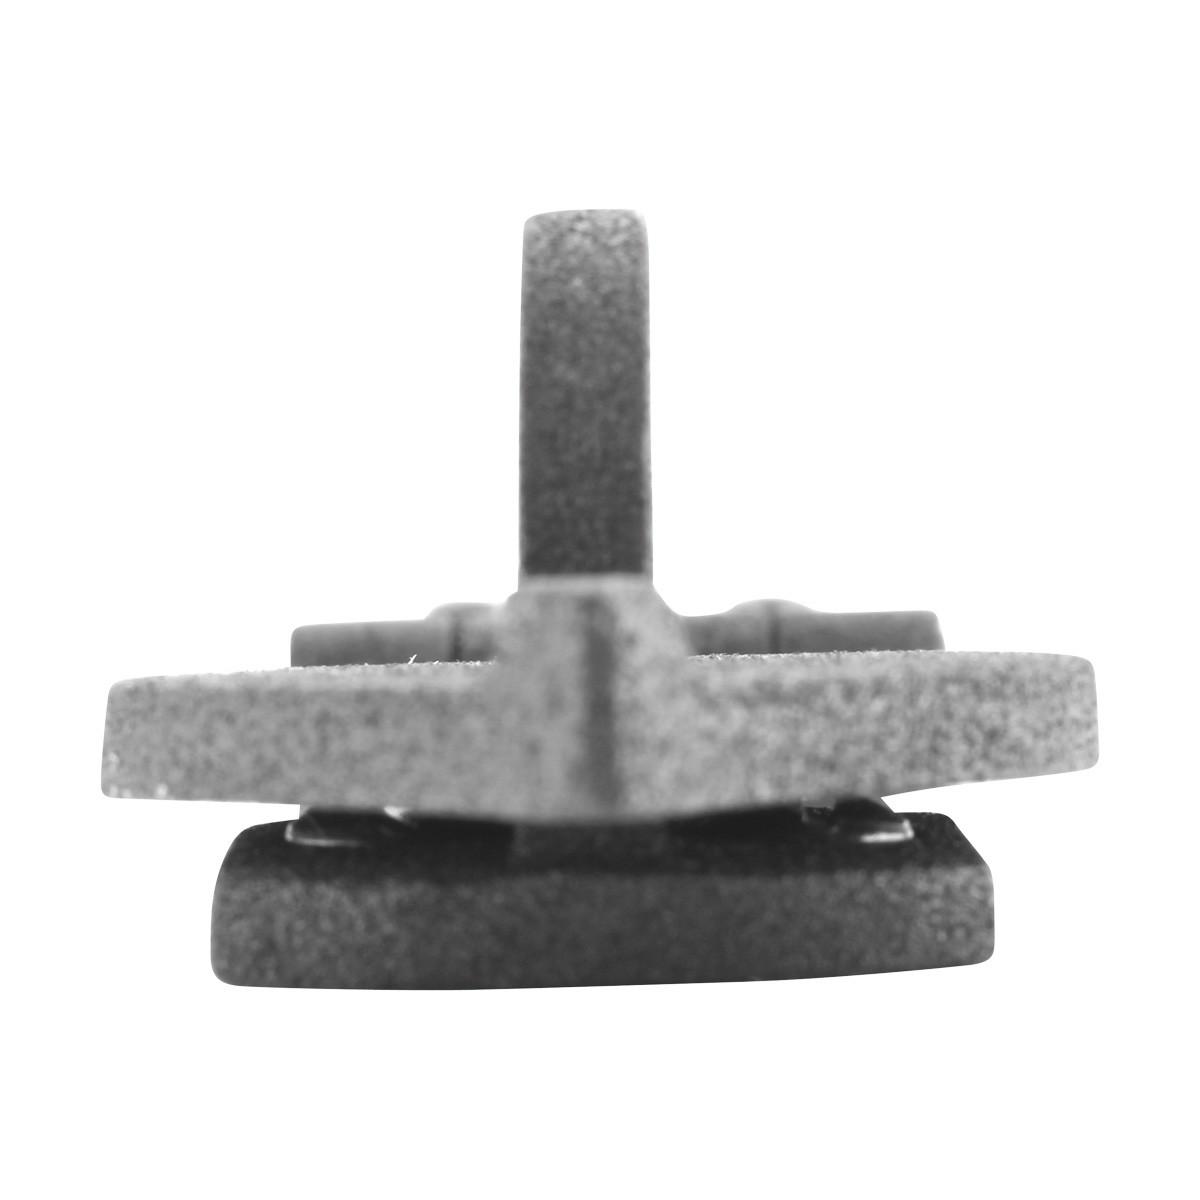 10 Hasp Black Wrought Iron 1 34 H x 8 12 W Hasps Hasp Wrought Iron Hasp